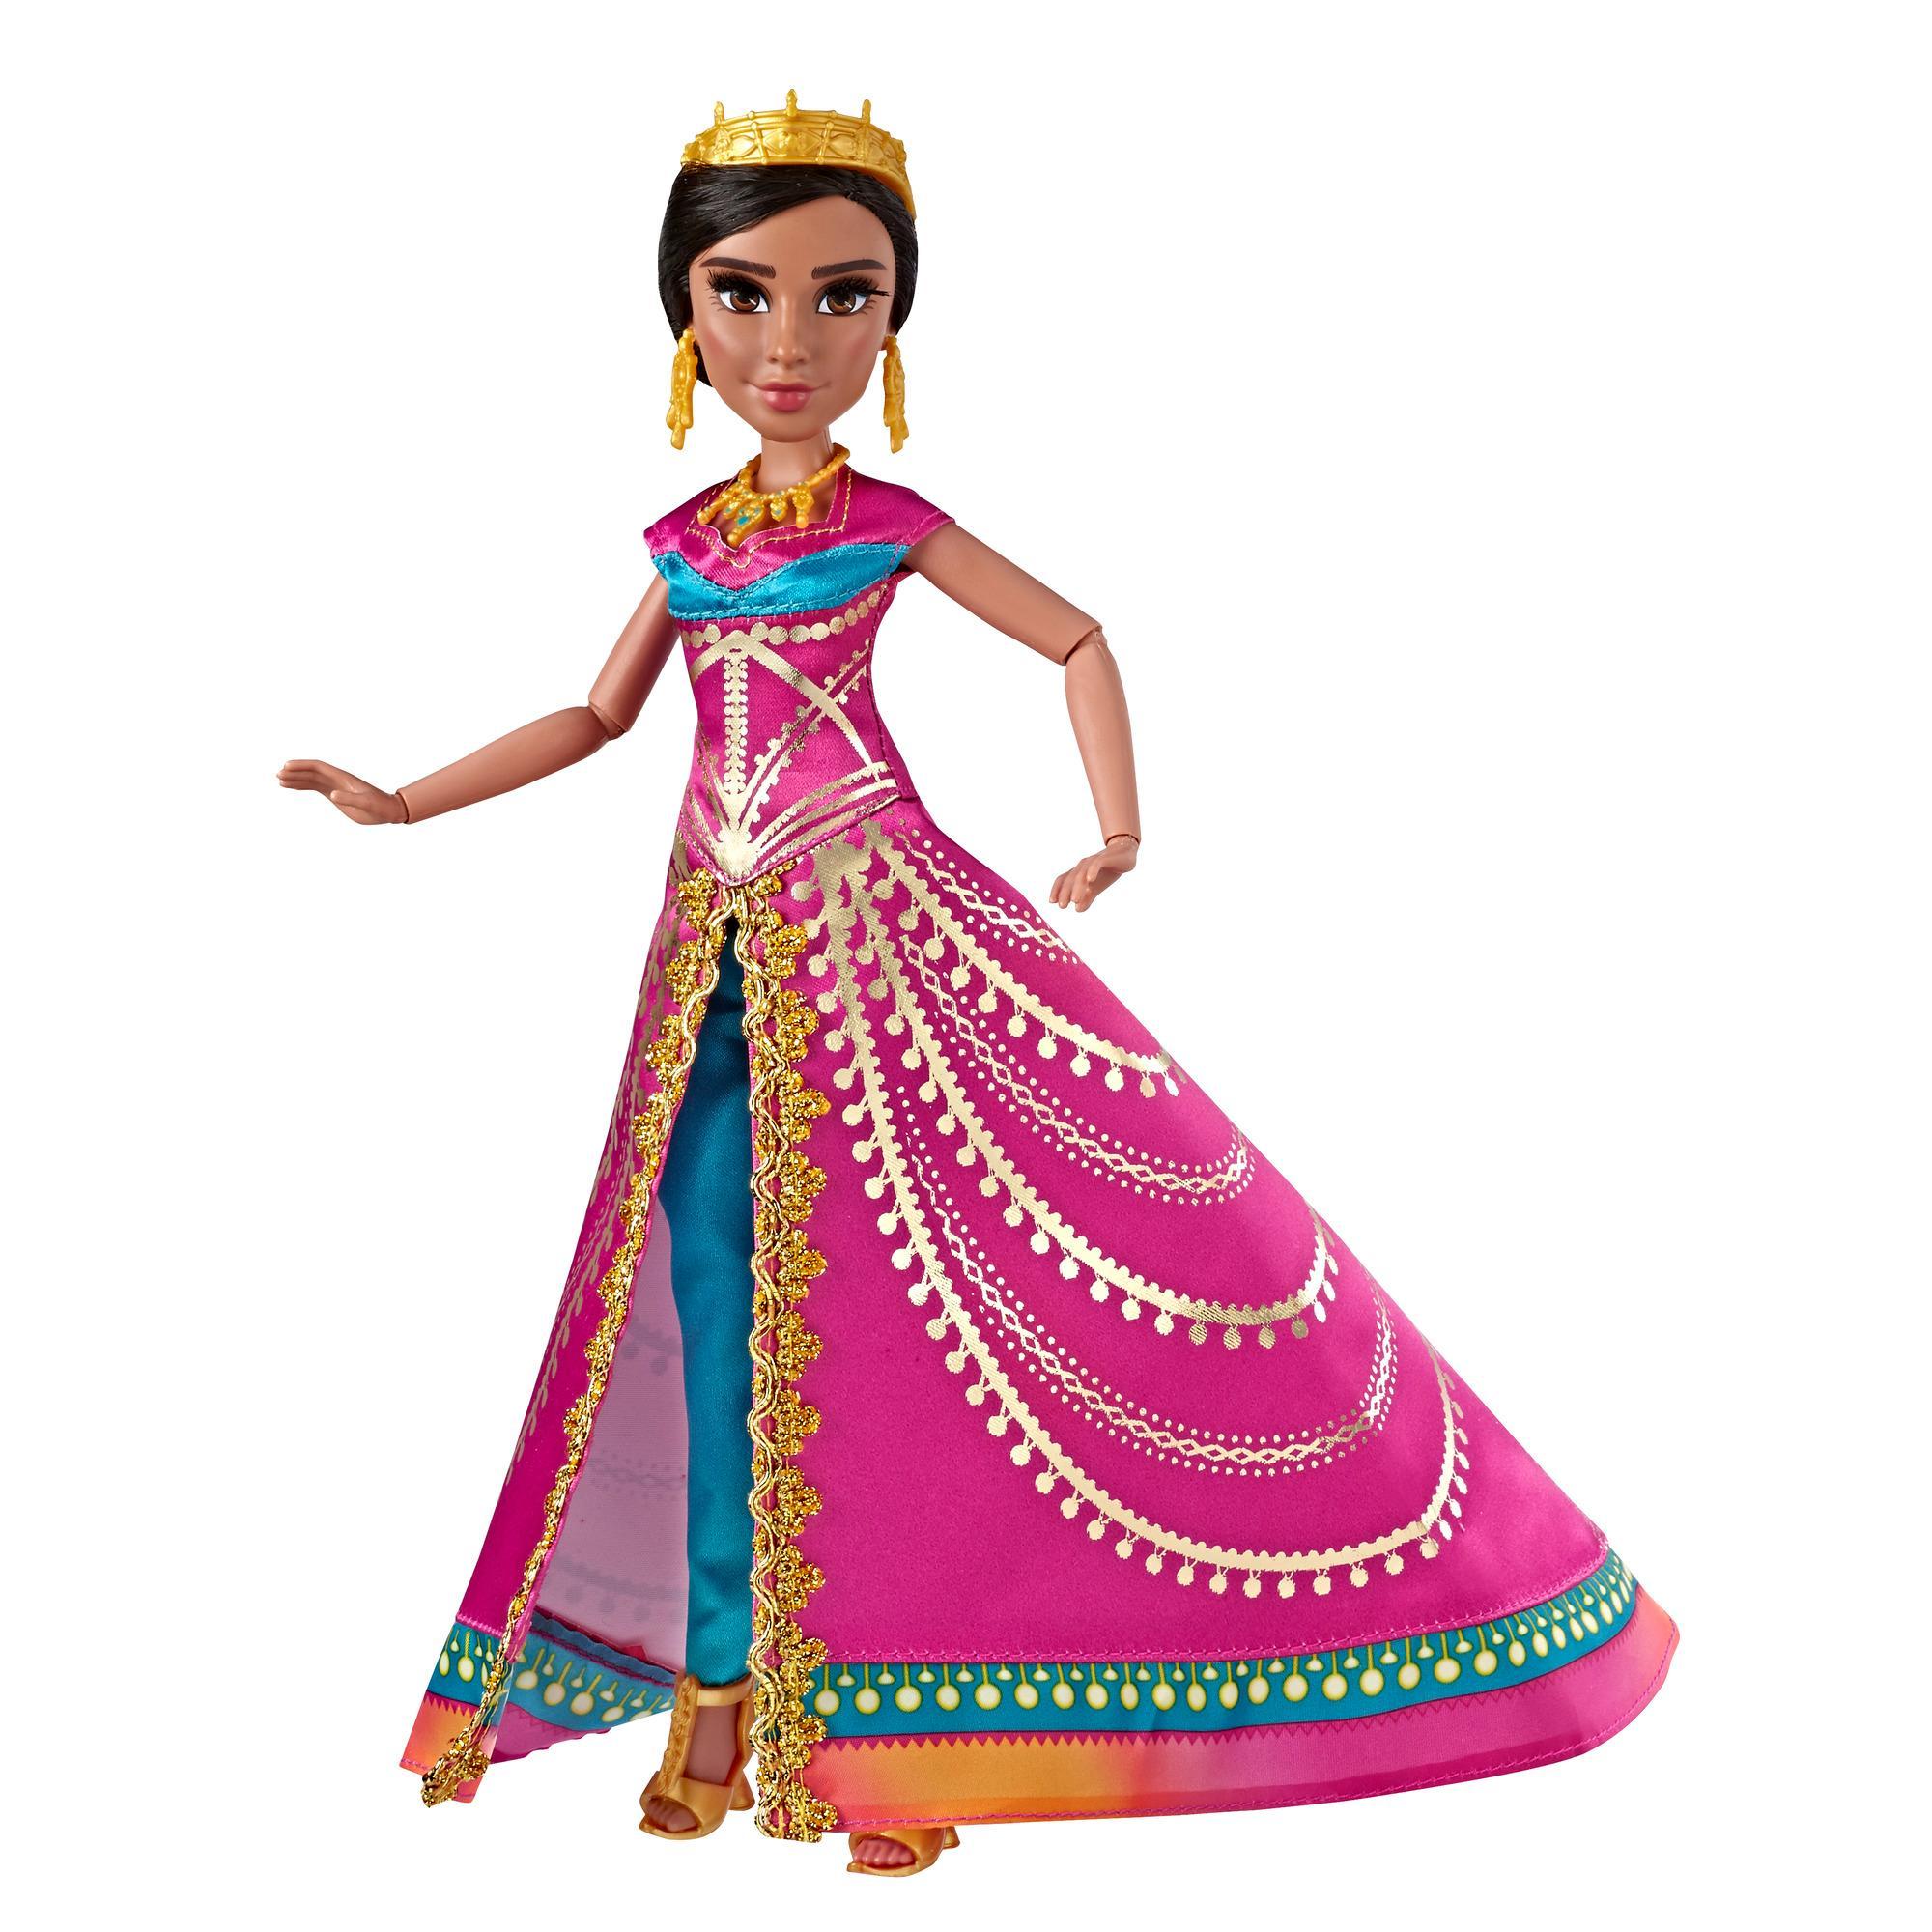 Disney Aladdin Glamorous Jasmine Deluxe Fashion Doll